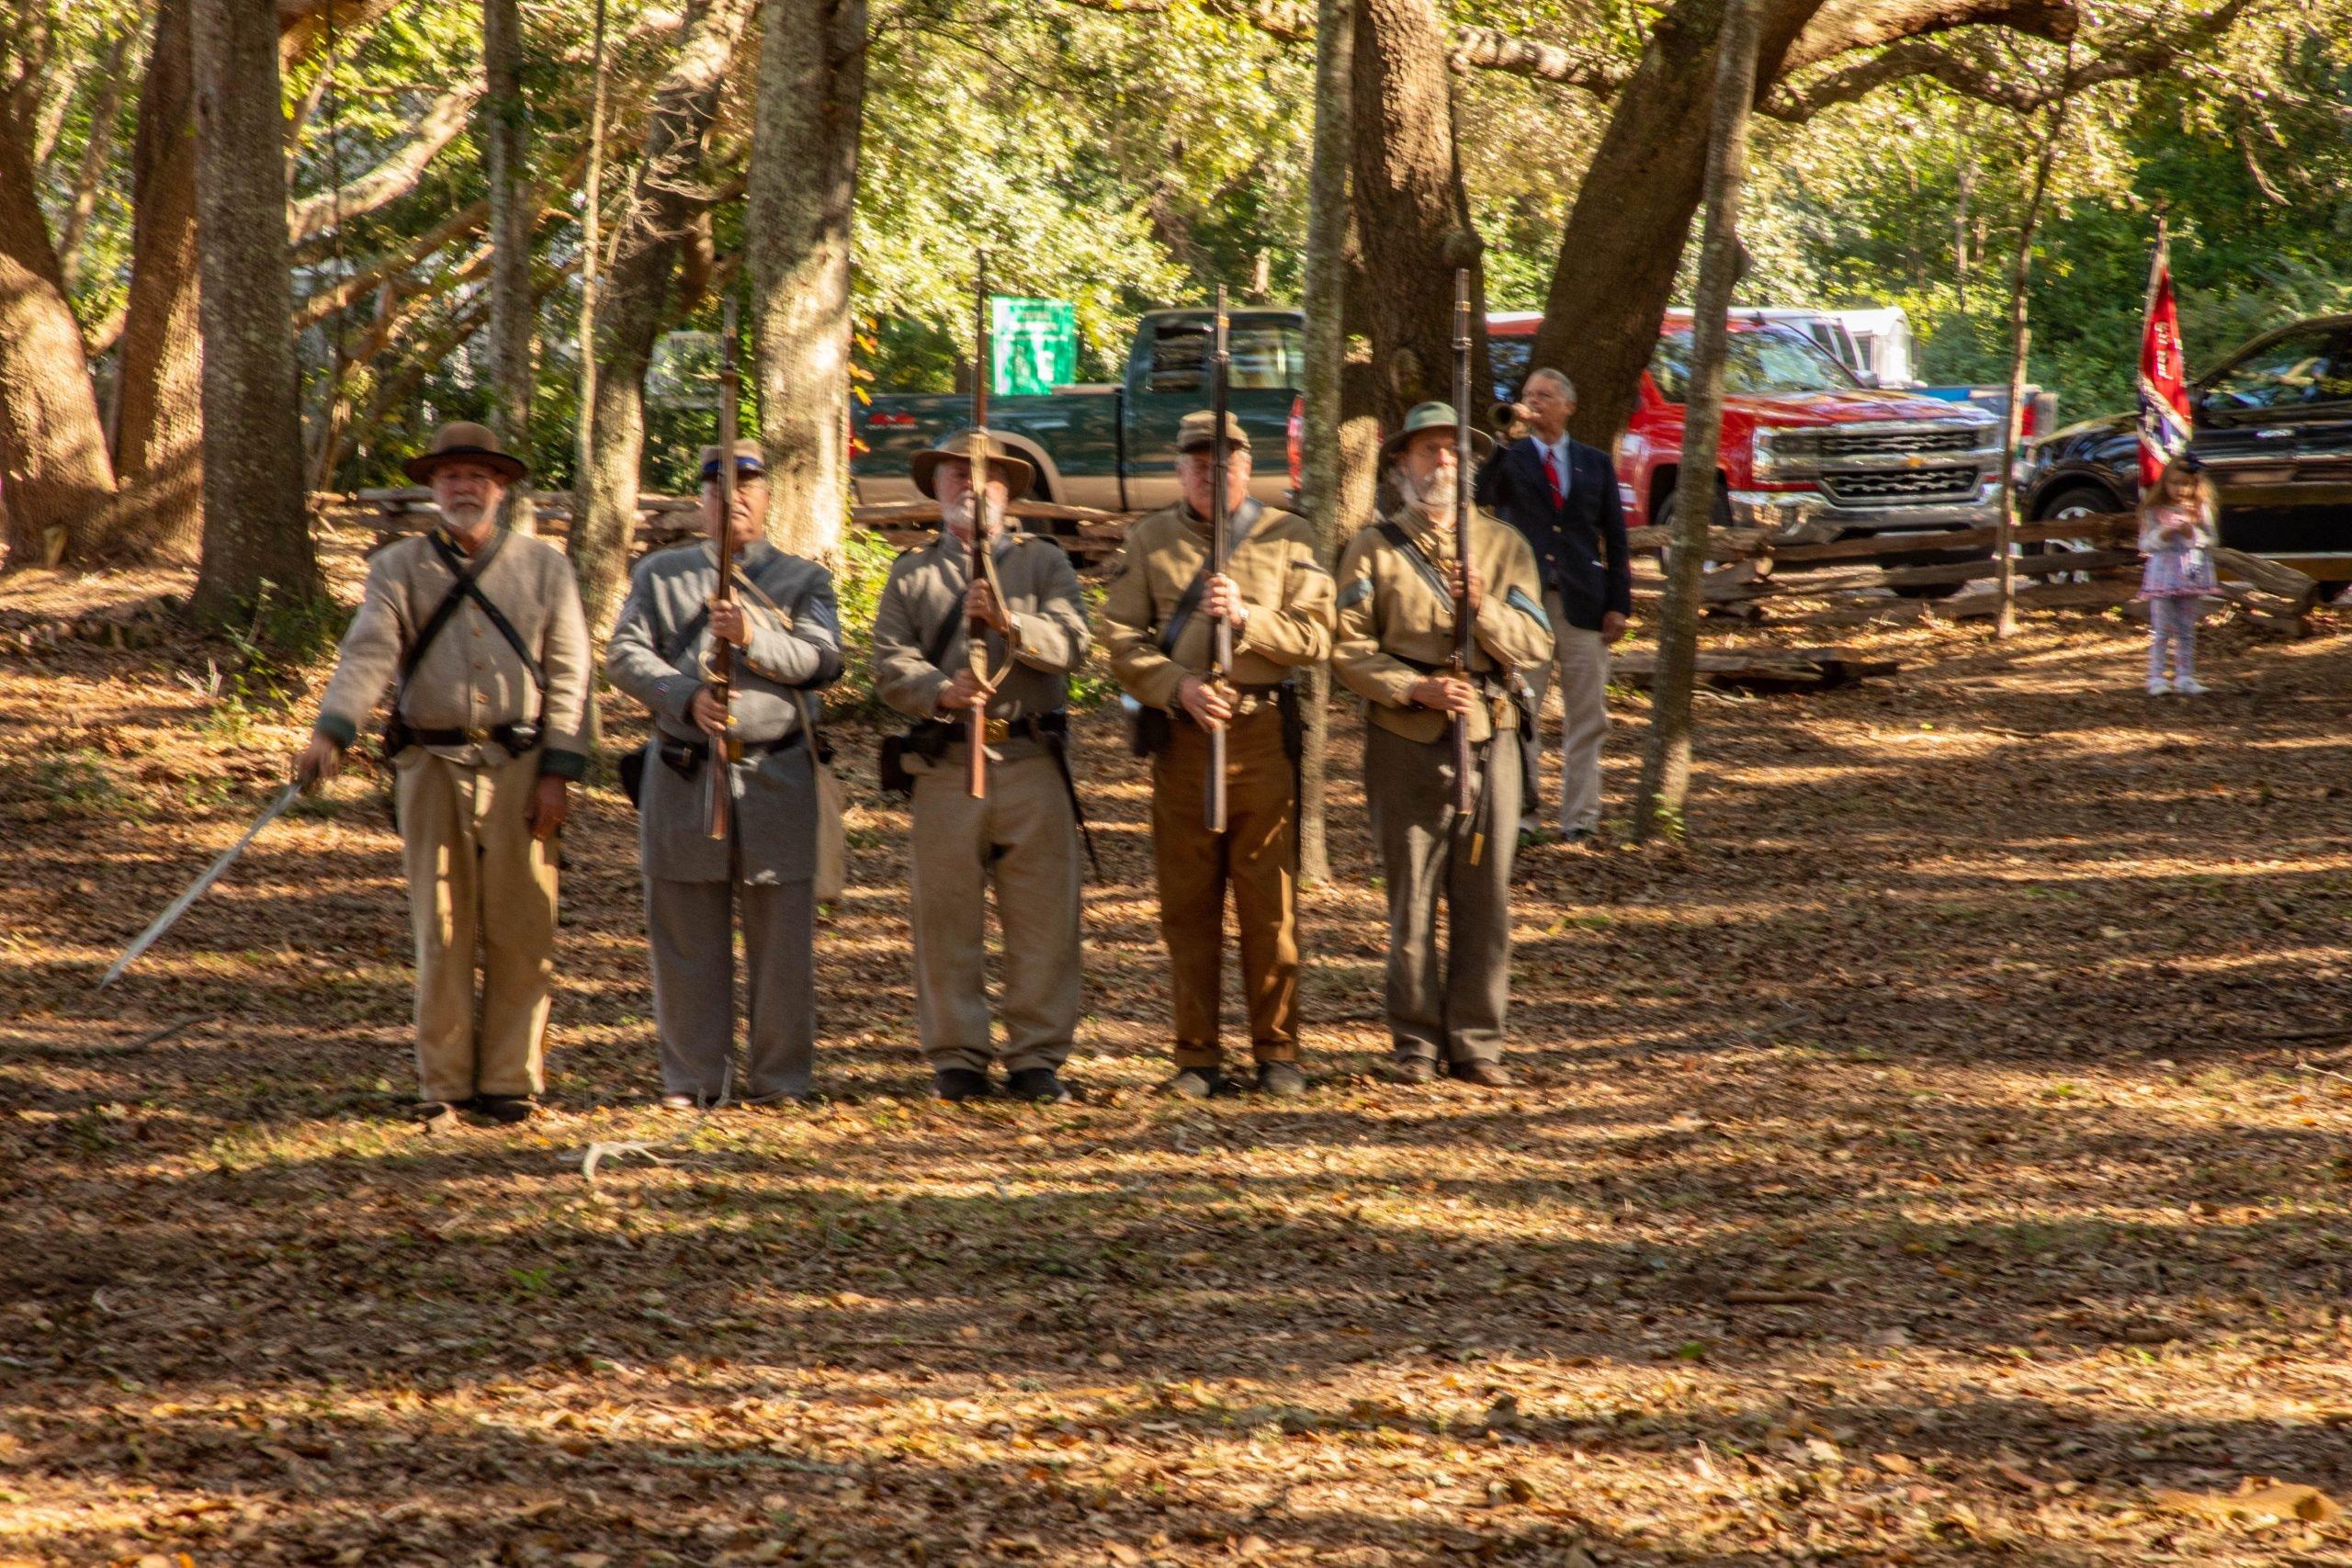 Sons of Confederate Veterans C.S.A. South Carolina 17